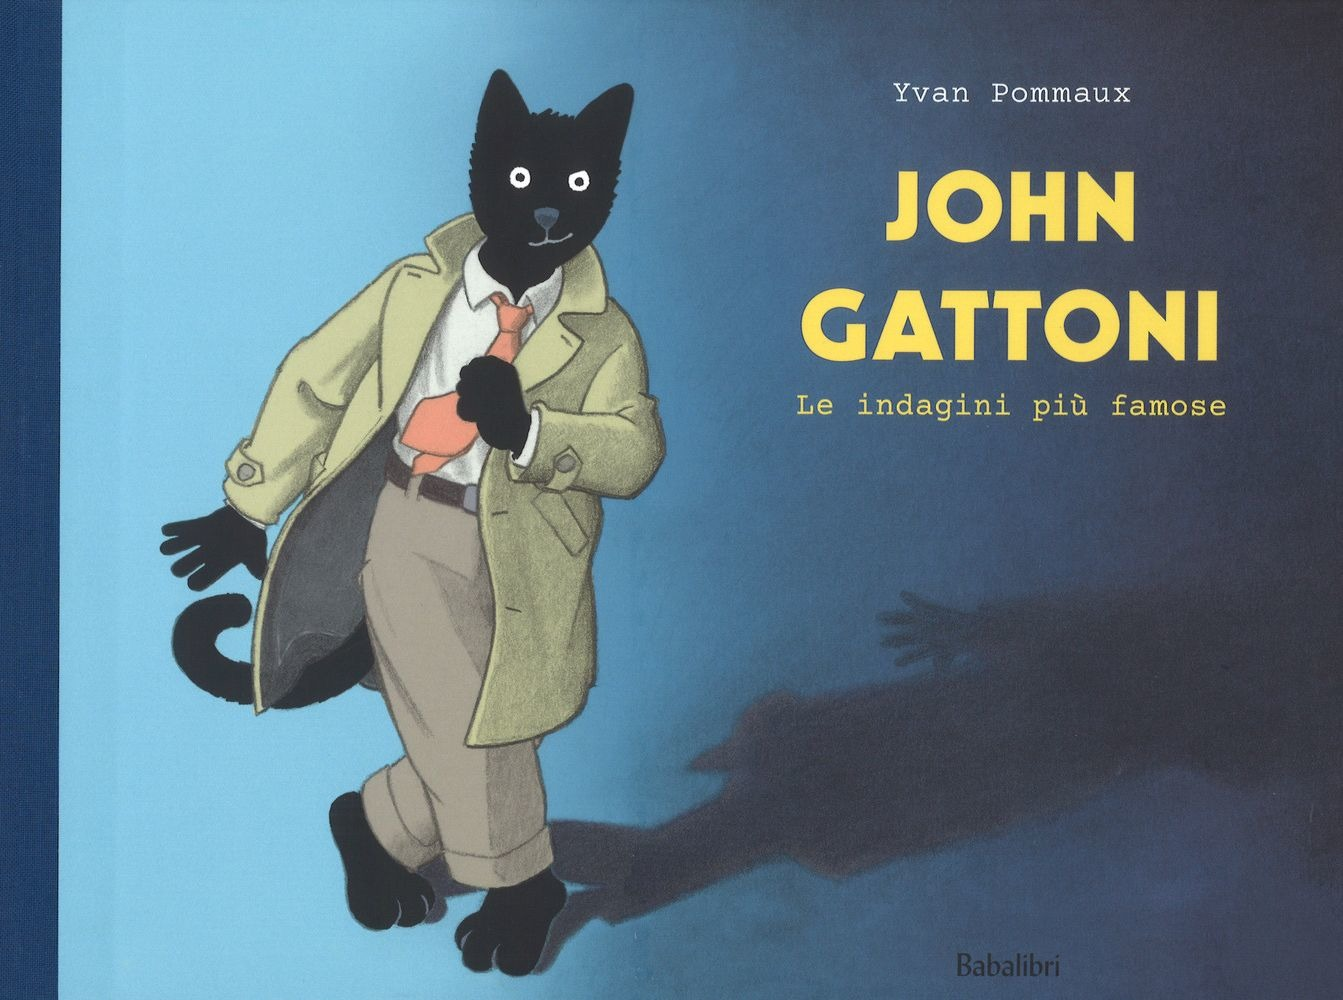 John Gattoni. Le indagini più famose - Yvan Pommaux